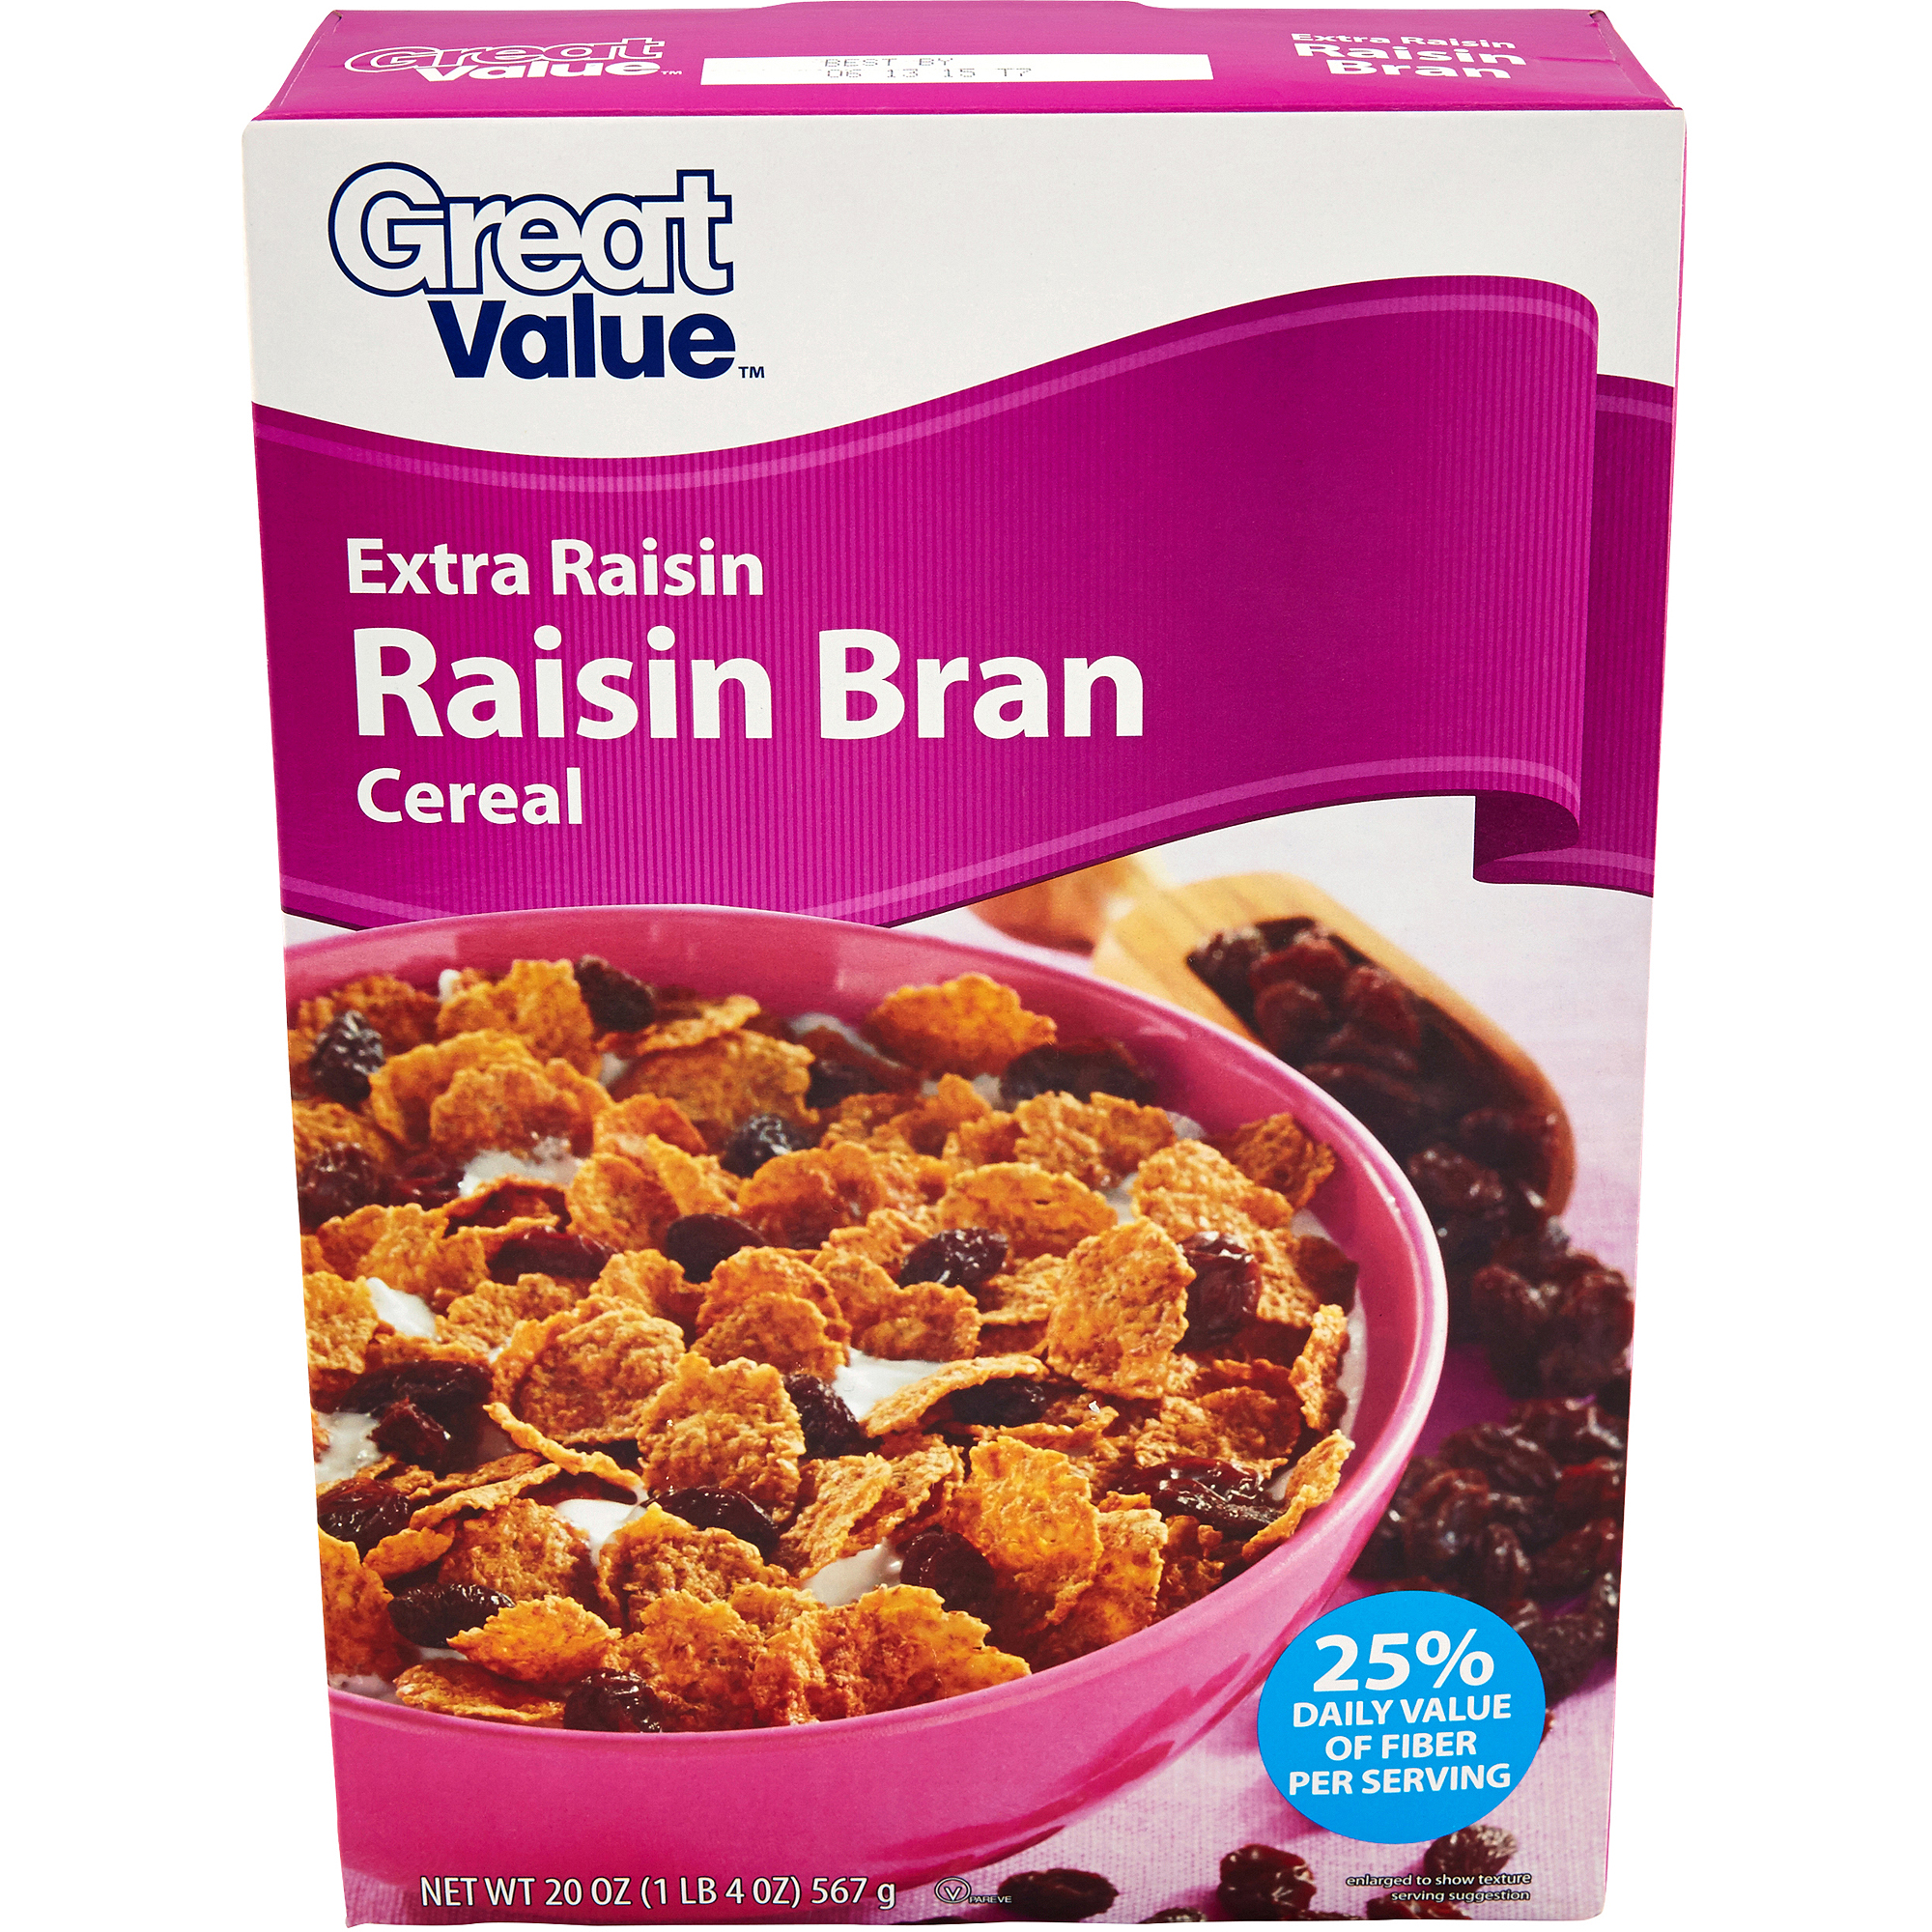 Great Value Extra Raisin Bran Cereal, 20 oz